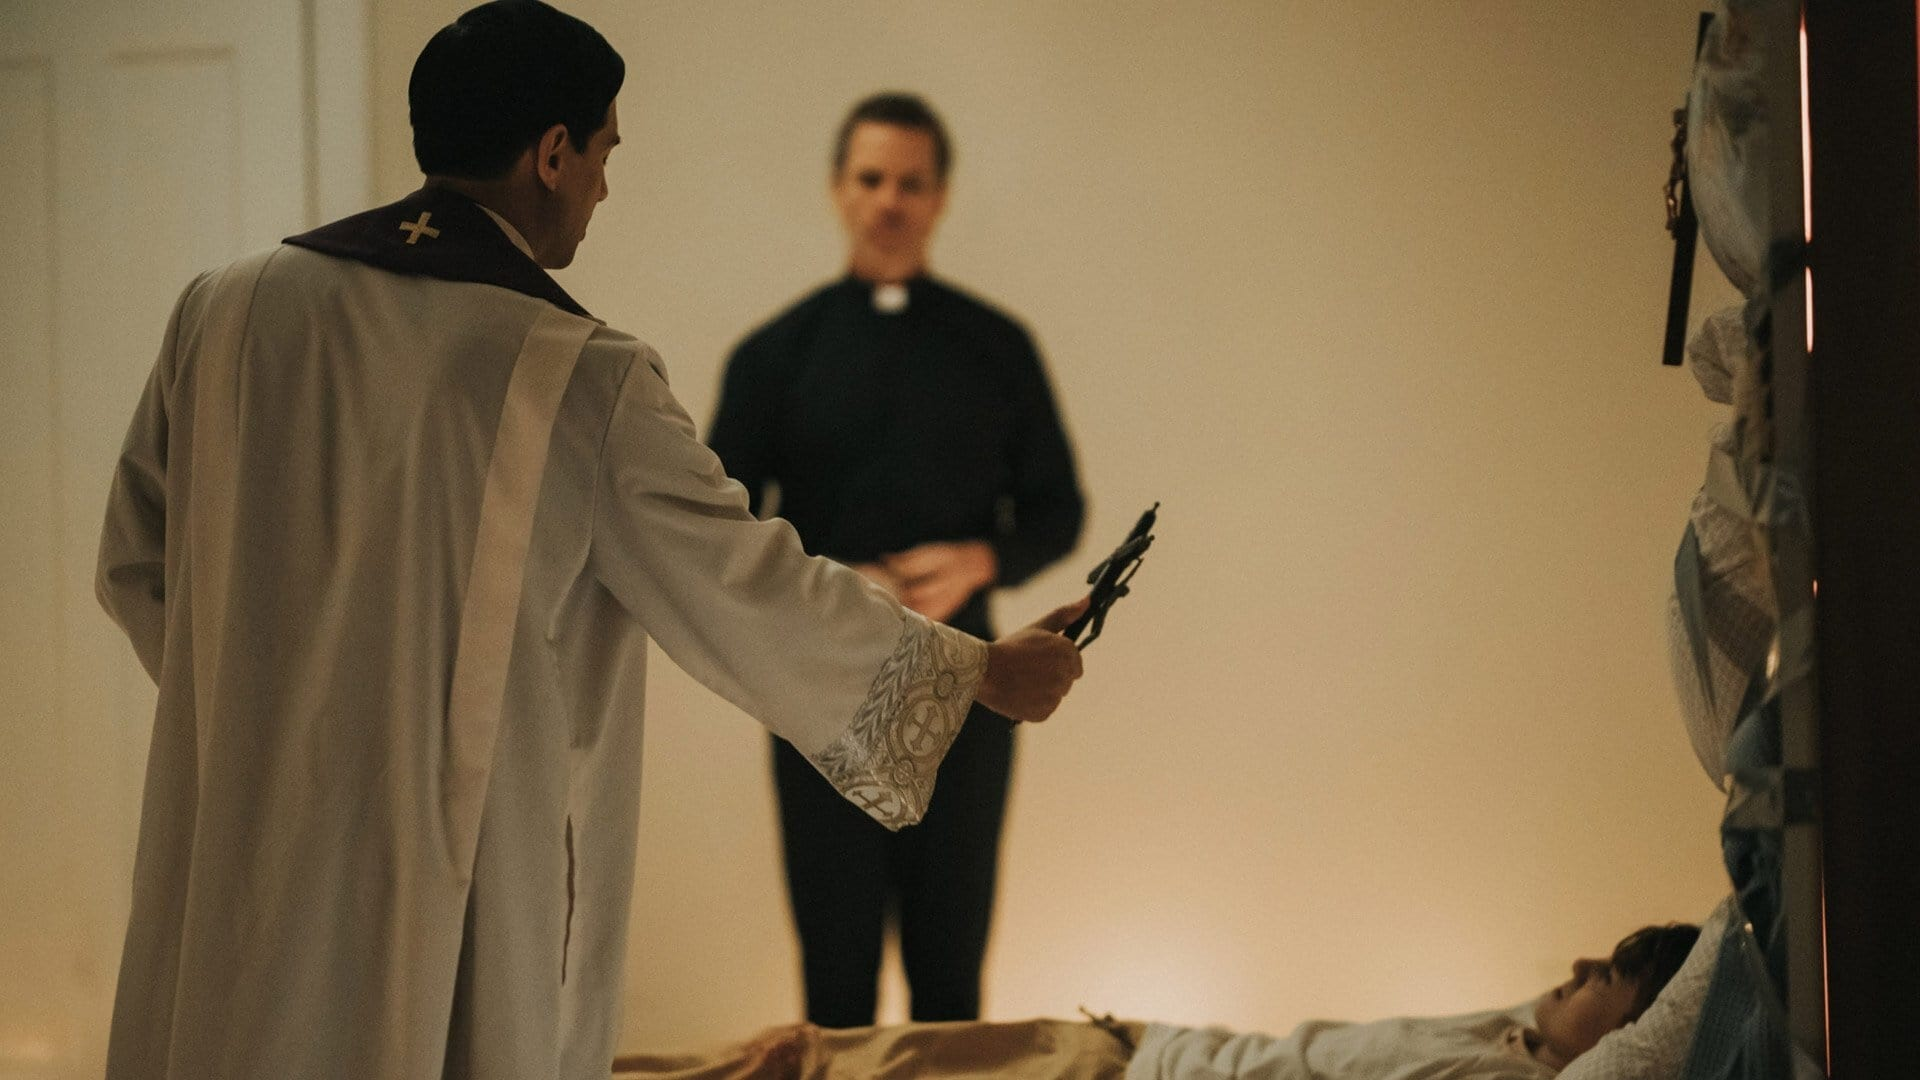 Exorcismo en el Séptimo Dia